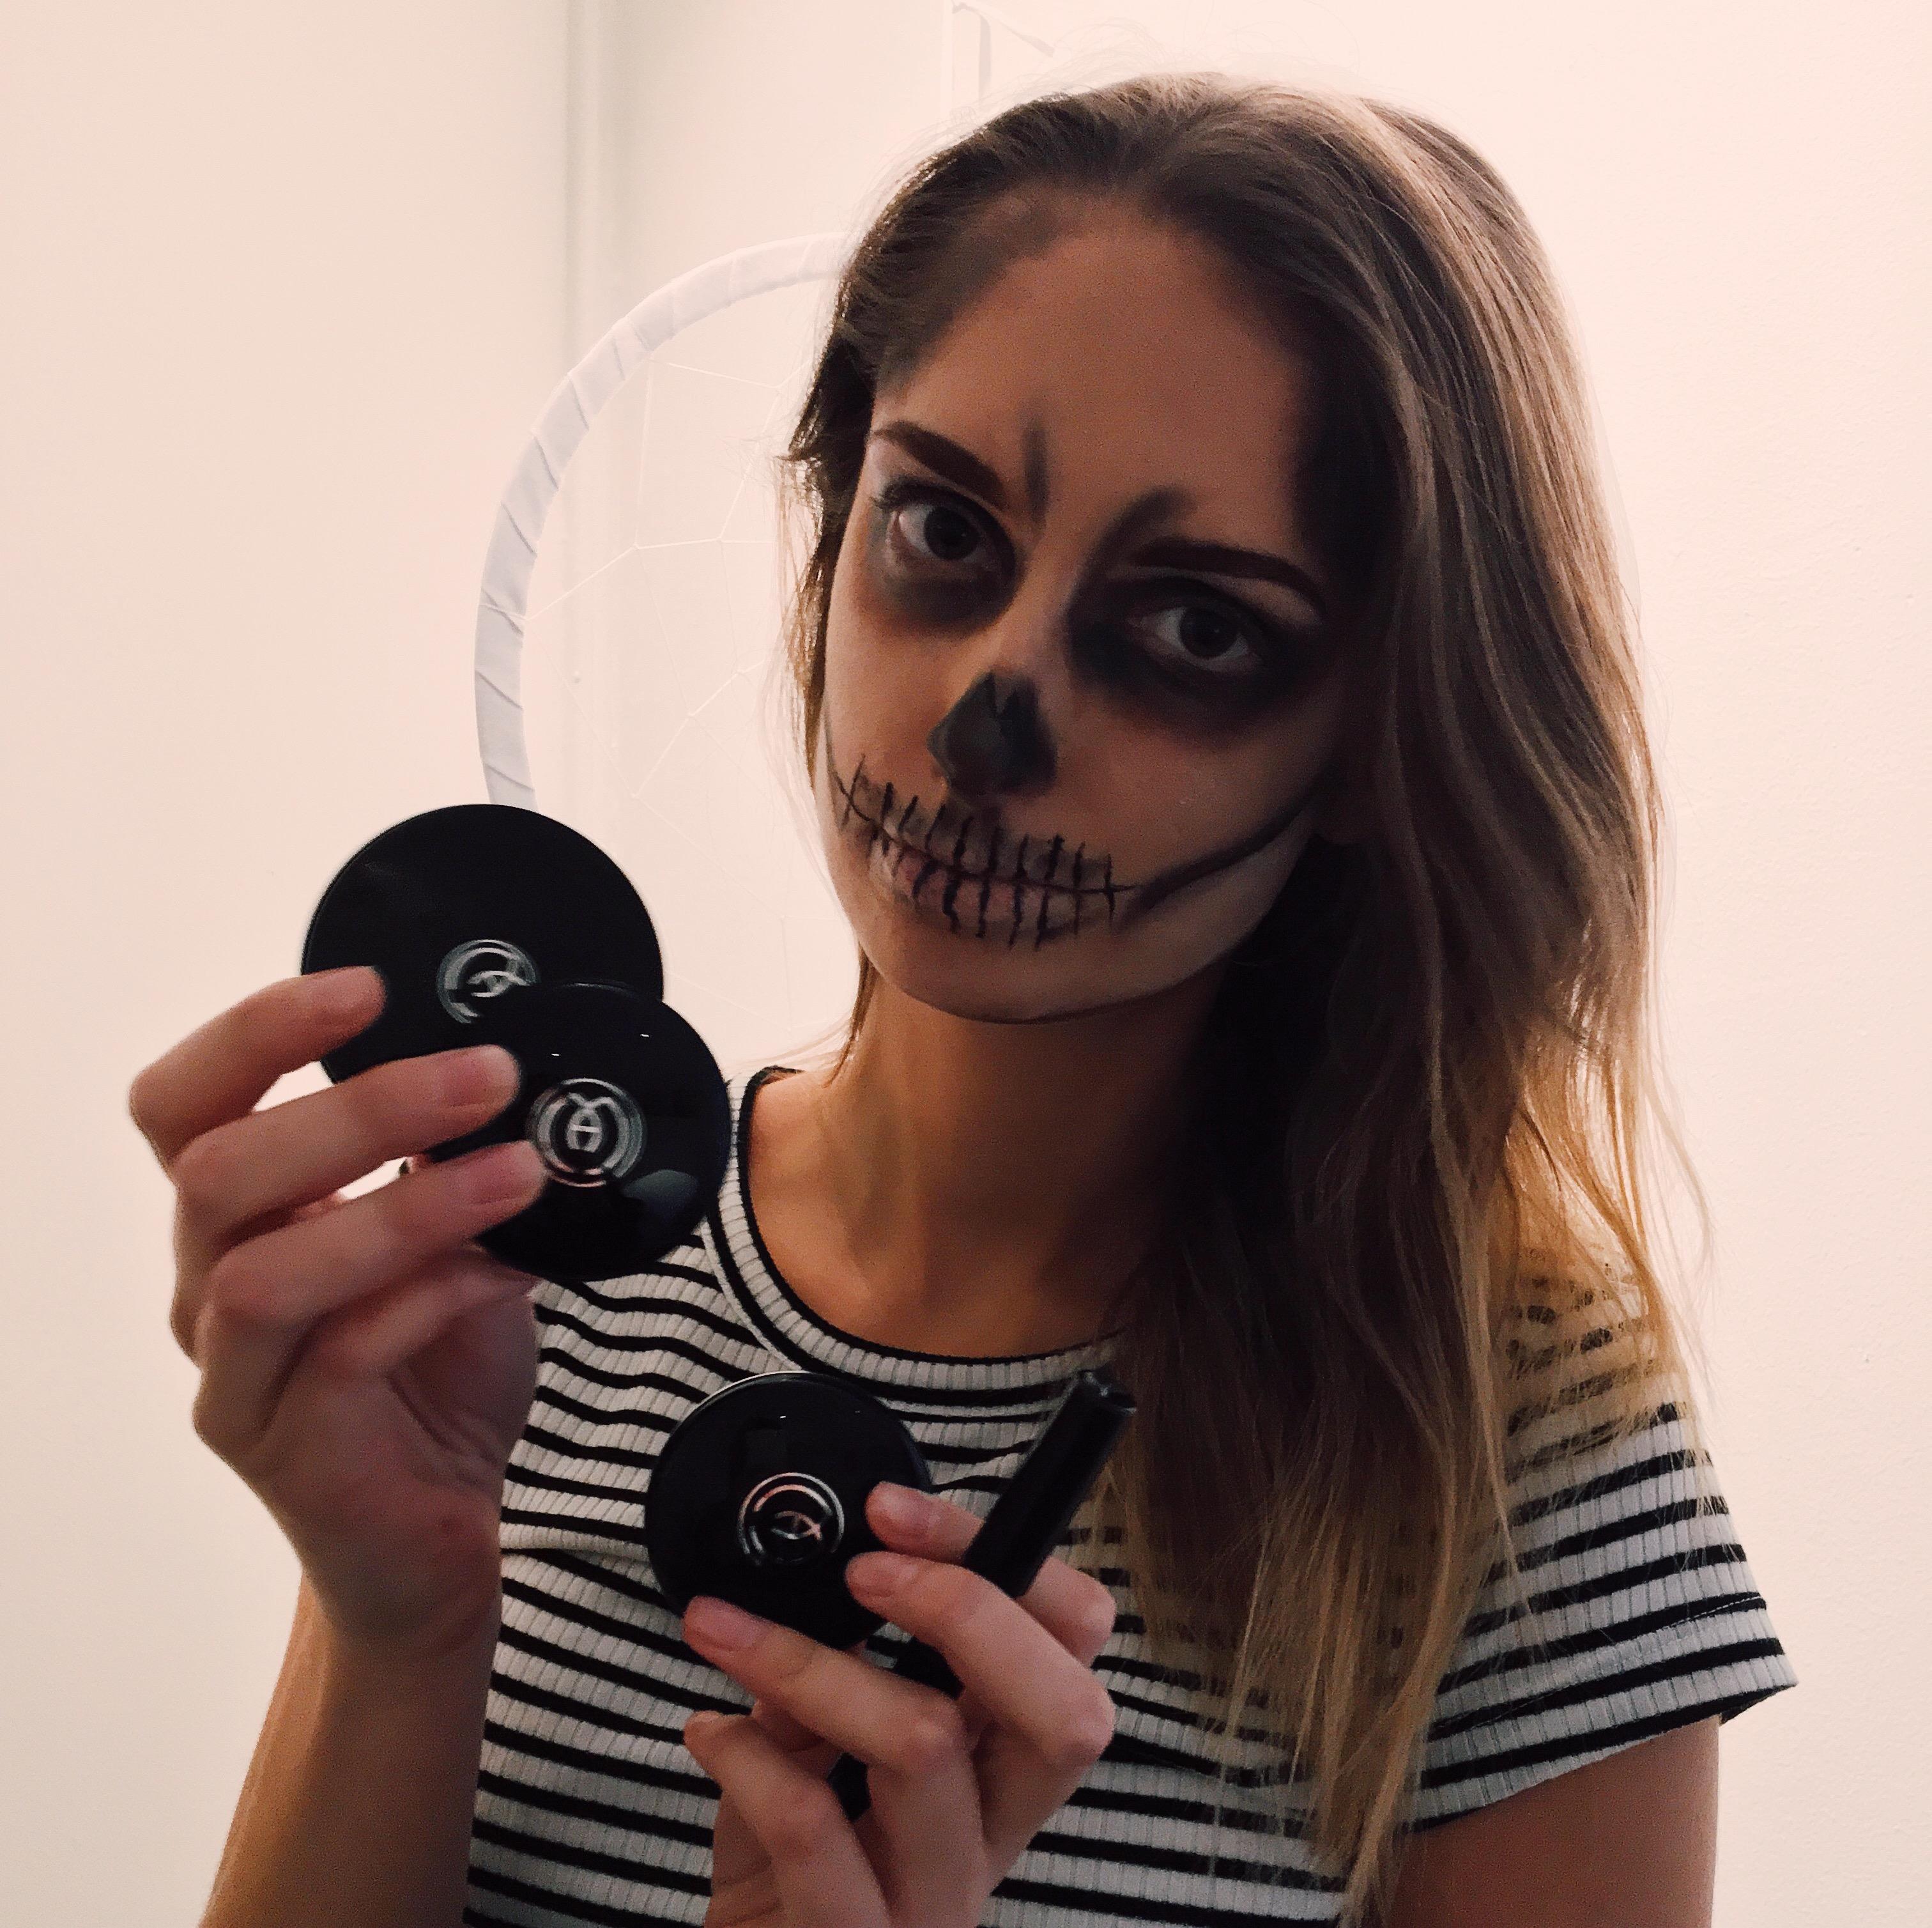 ekologiskt smink halloween - maria åkerberg